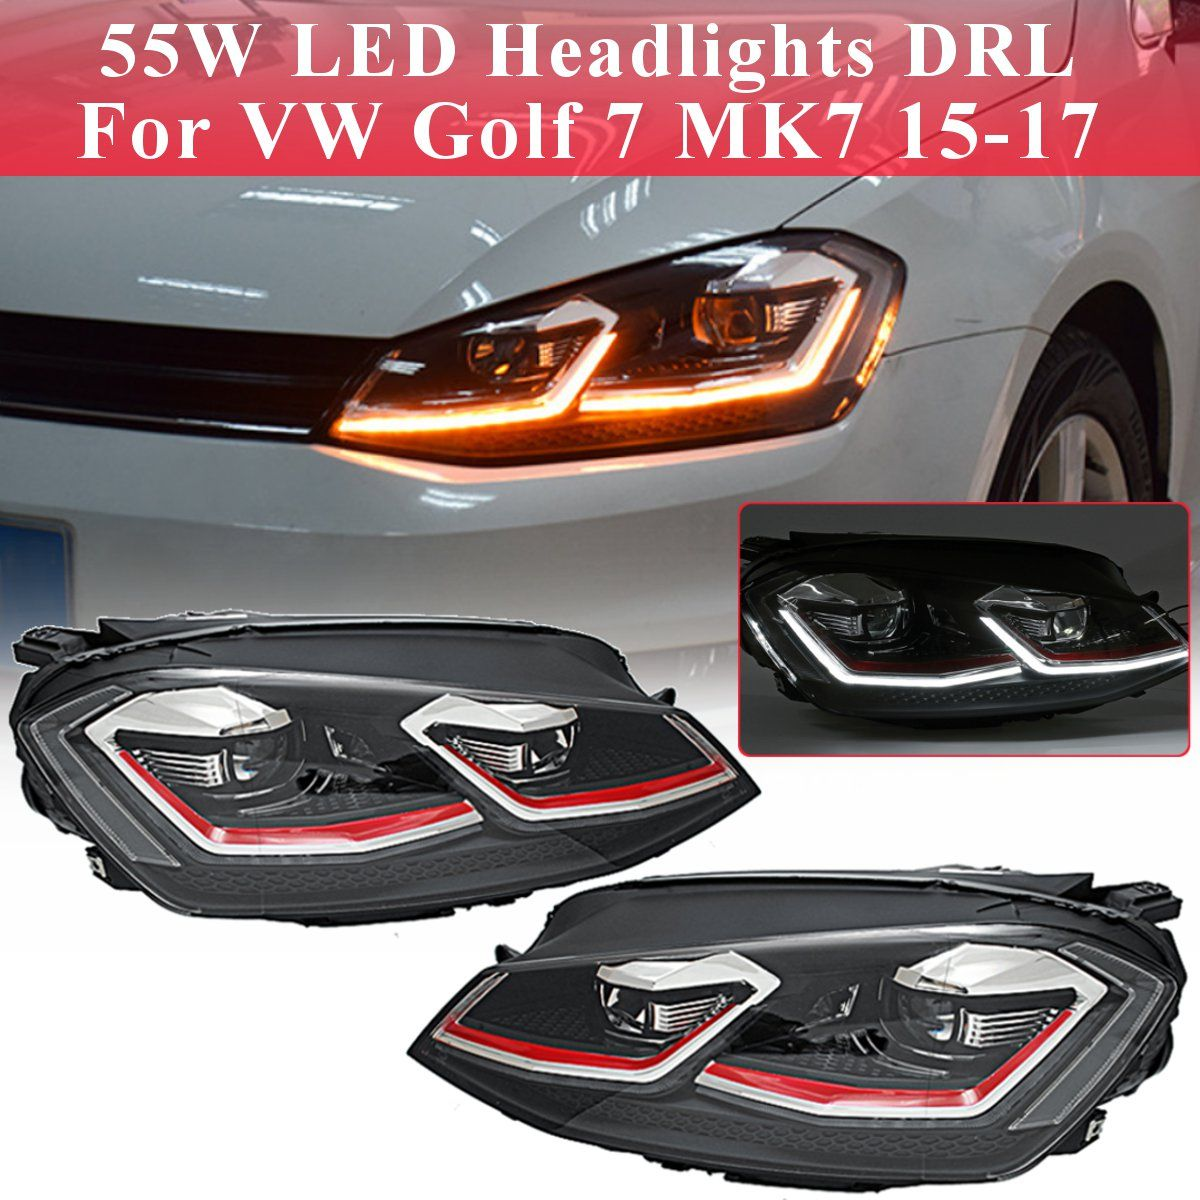 Für VW Golf 7 MK7 Auto Styling Kopf Lampe Fall Klar LED Scheinwerfer DRL Objektiv Doppel Strahl Bi-Xenon für Golf 7 2015 2016 2017